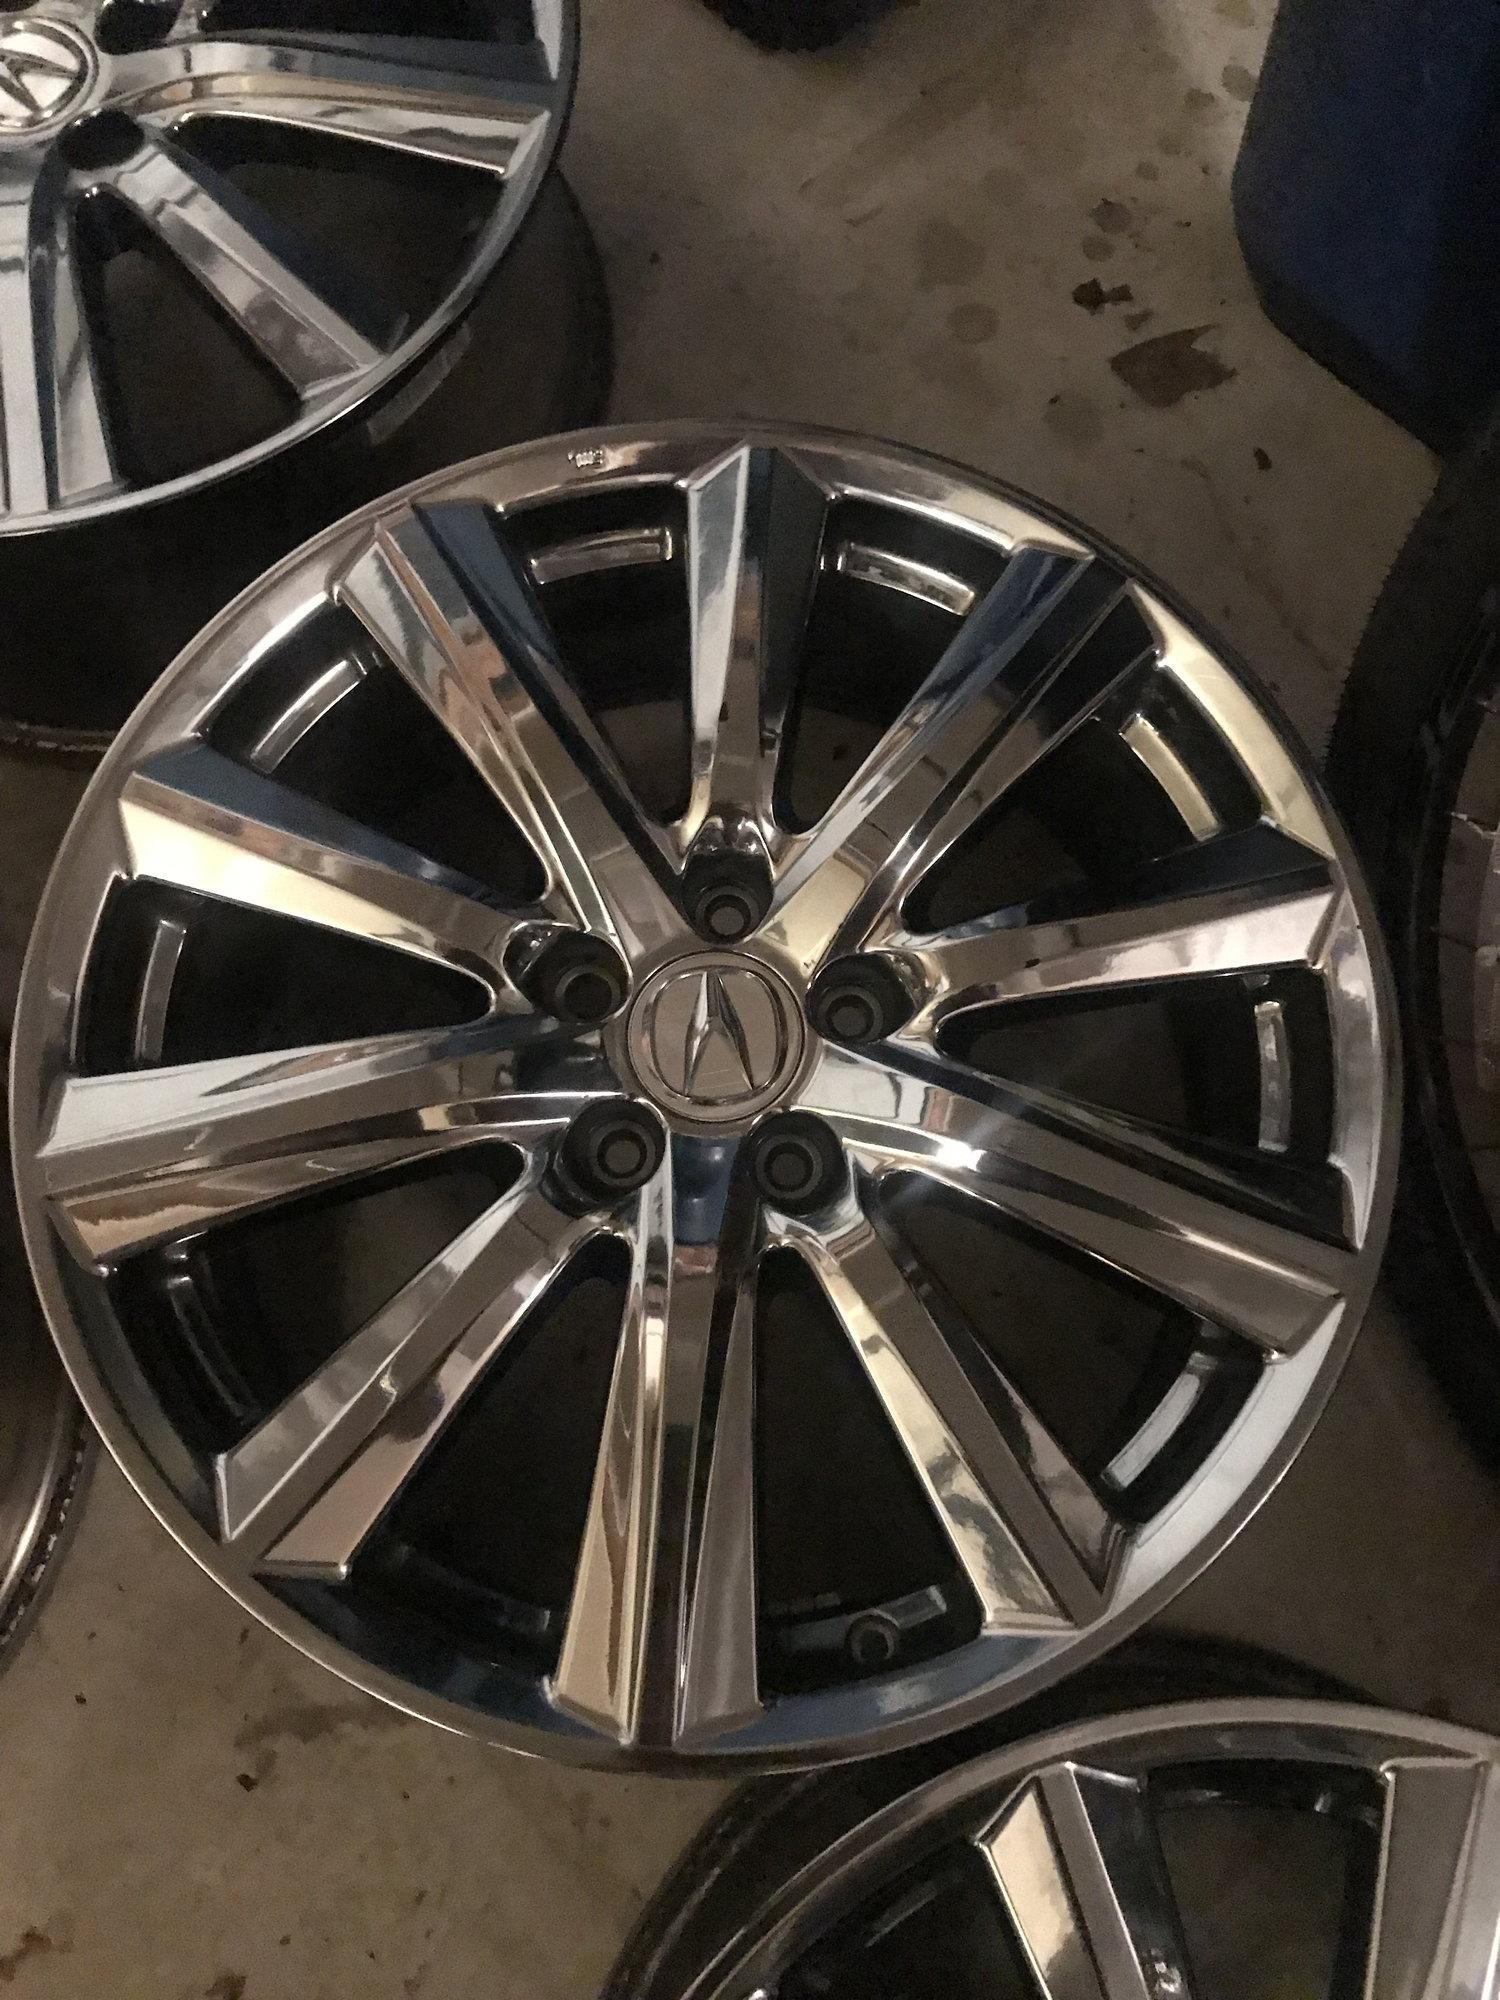 mdx acura wheels chrome pvd 5x114 19x8 fs acurazine expired tires 2008 tl